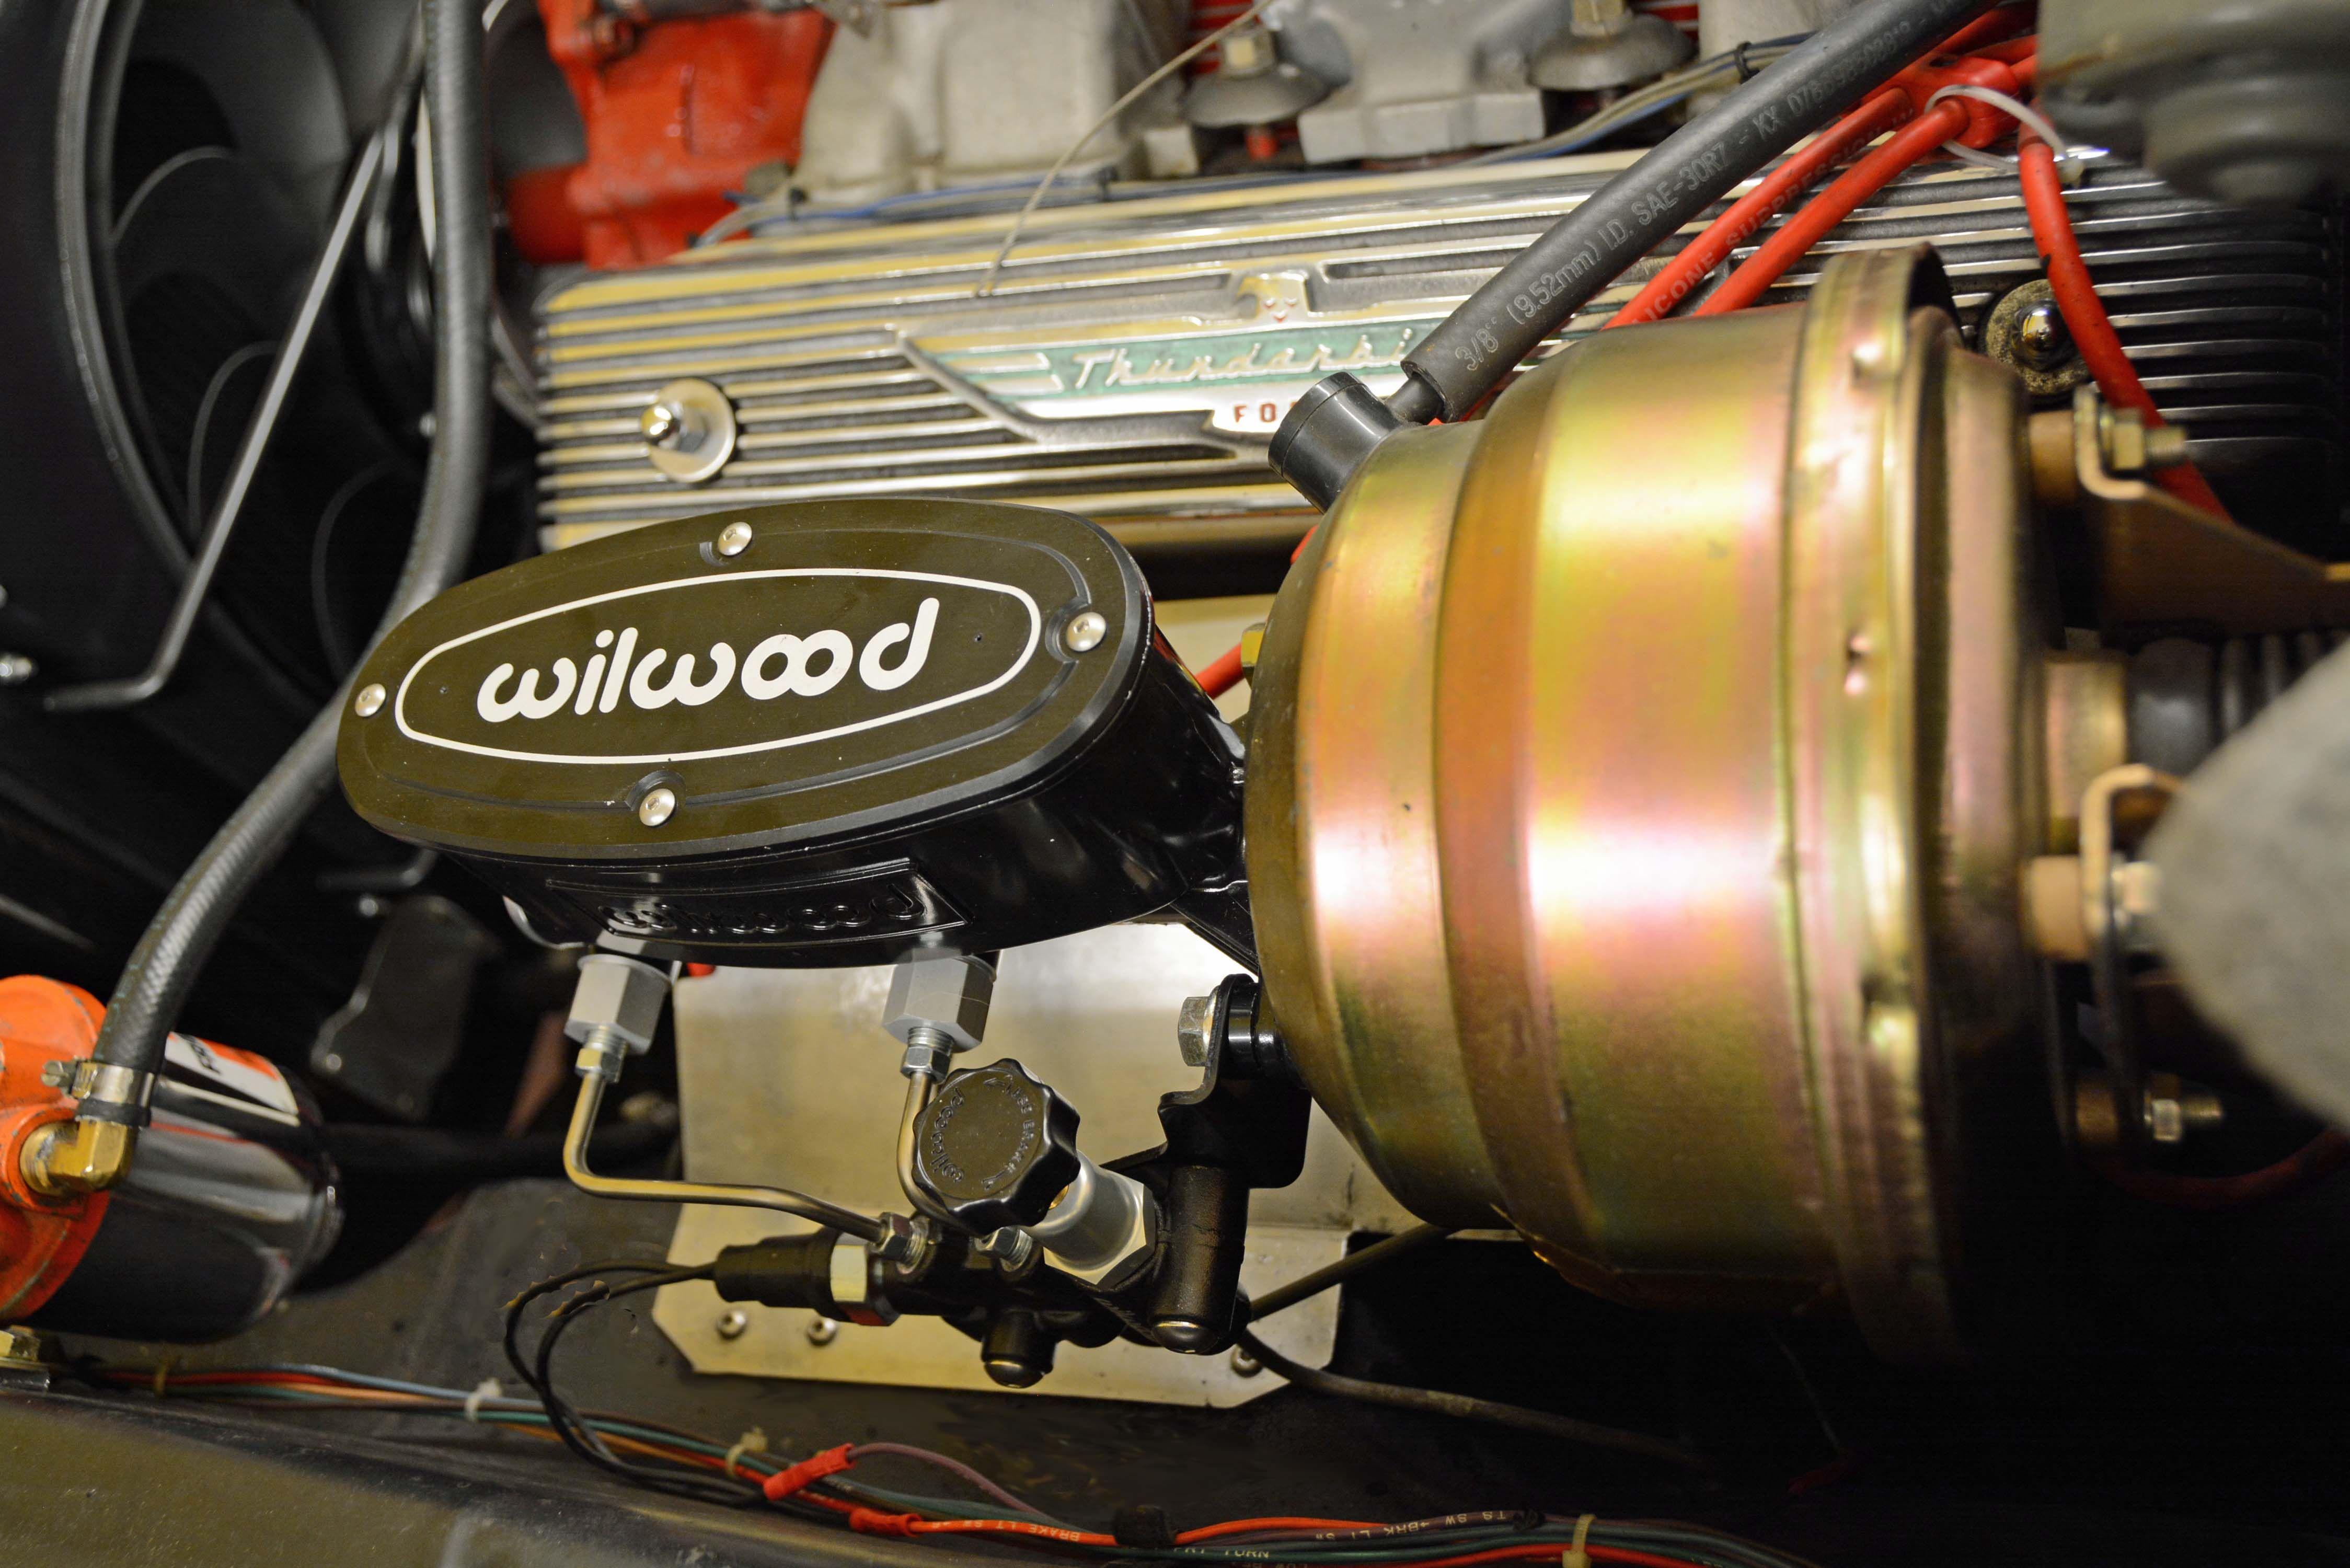 Installing A Wilwood Disc Brake Master Cylinder And Proportioning 1948 Ford Valve